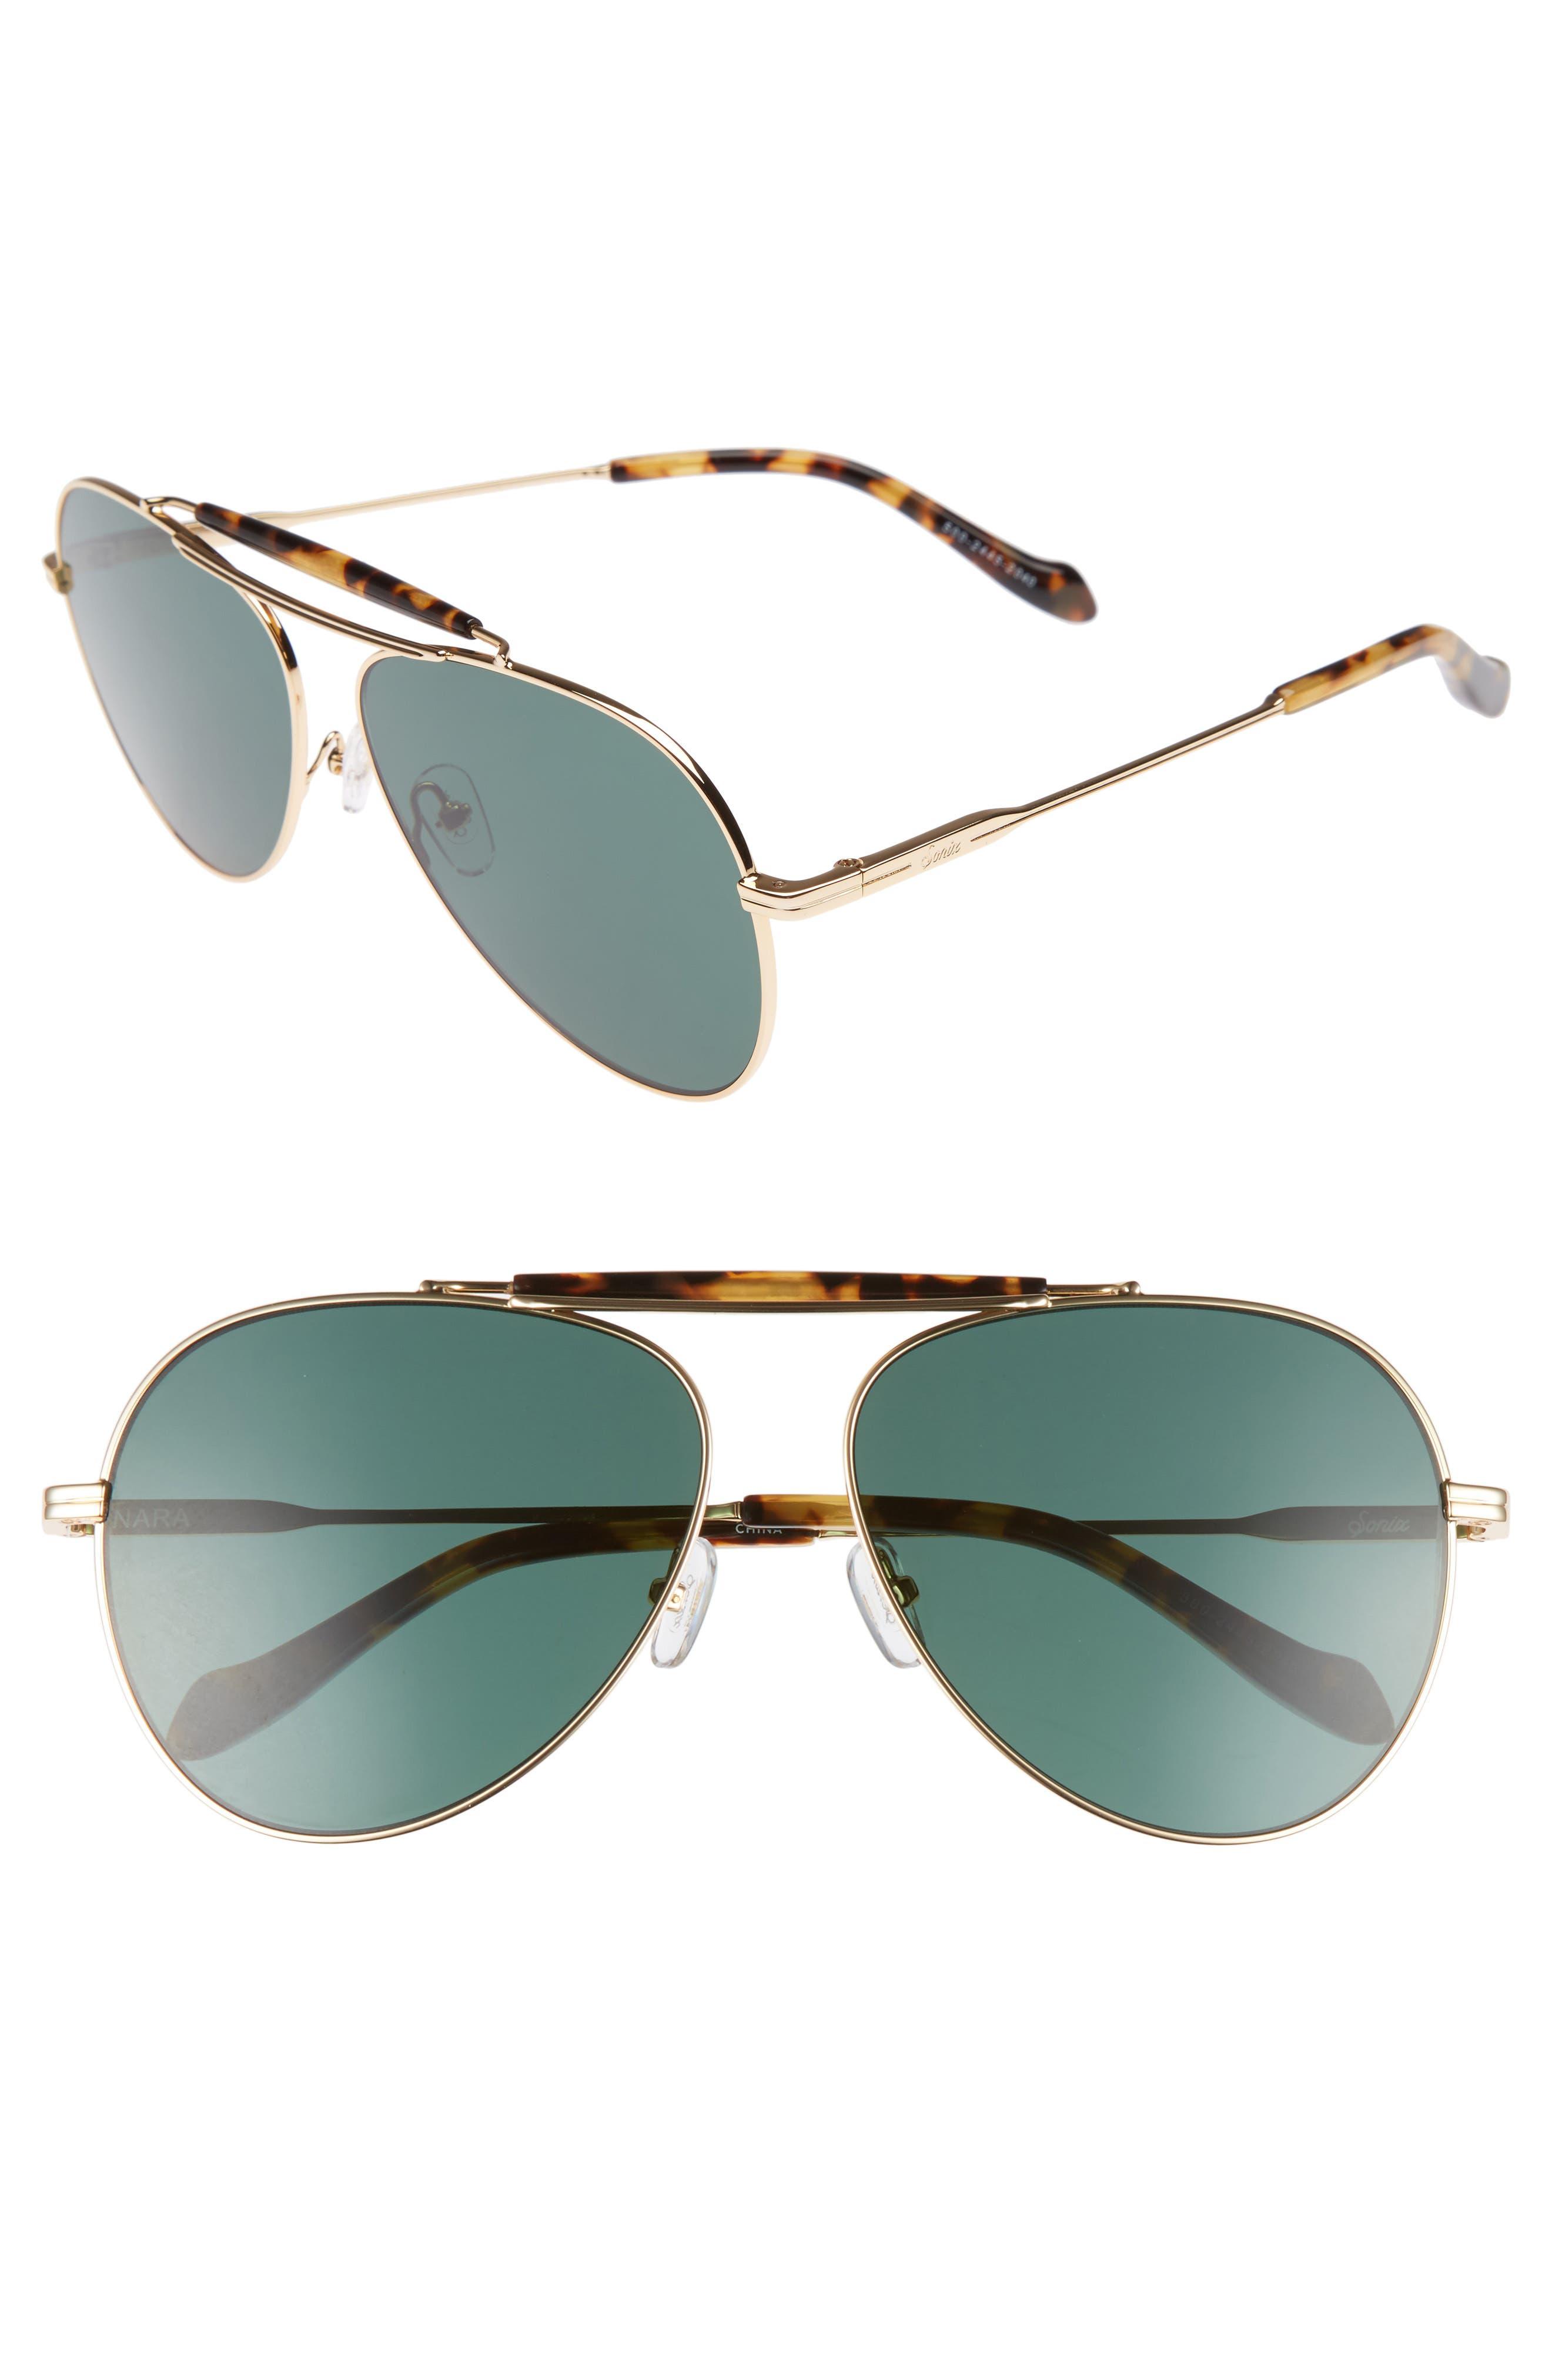 Nara 60mm Aviator Sunglasses,                         Main,                         color, Brown Tortoise/ Olive Lens